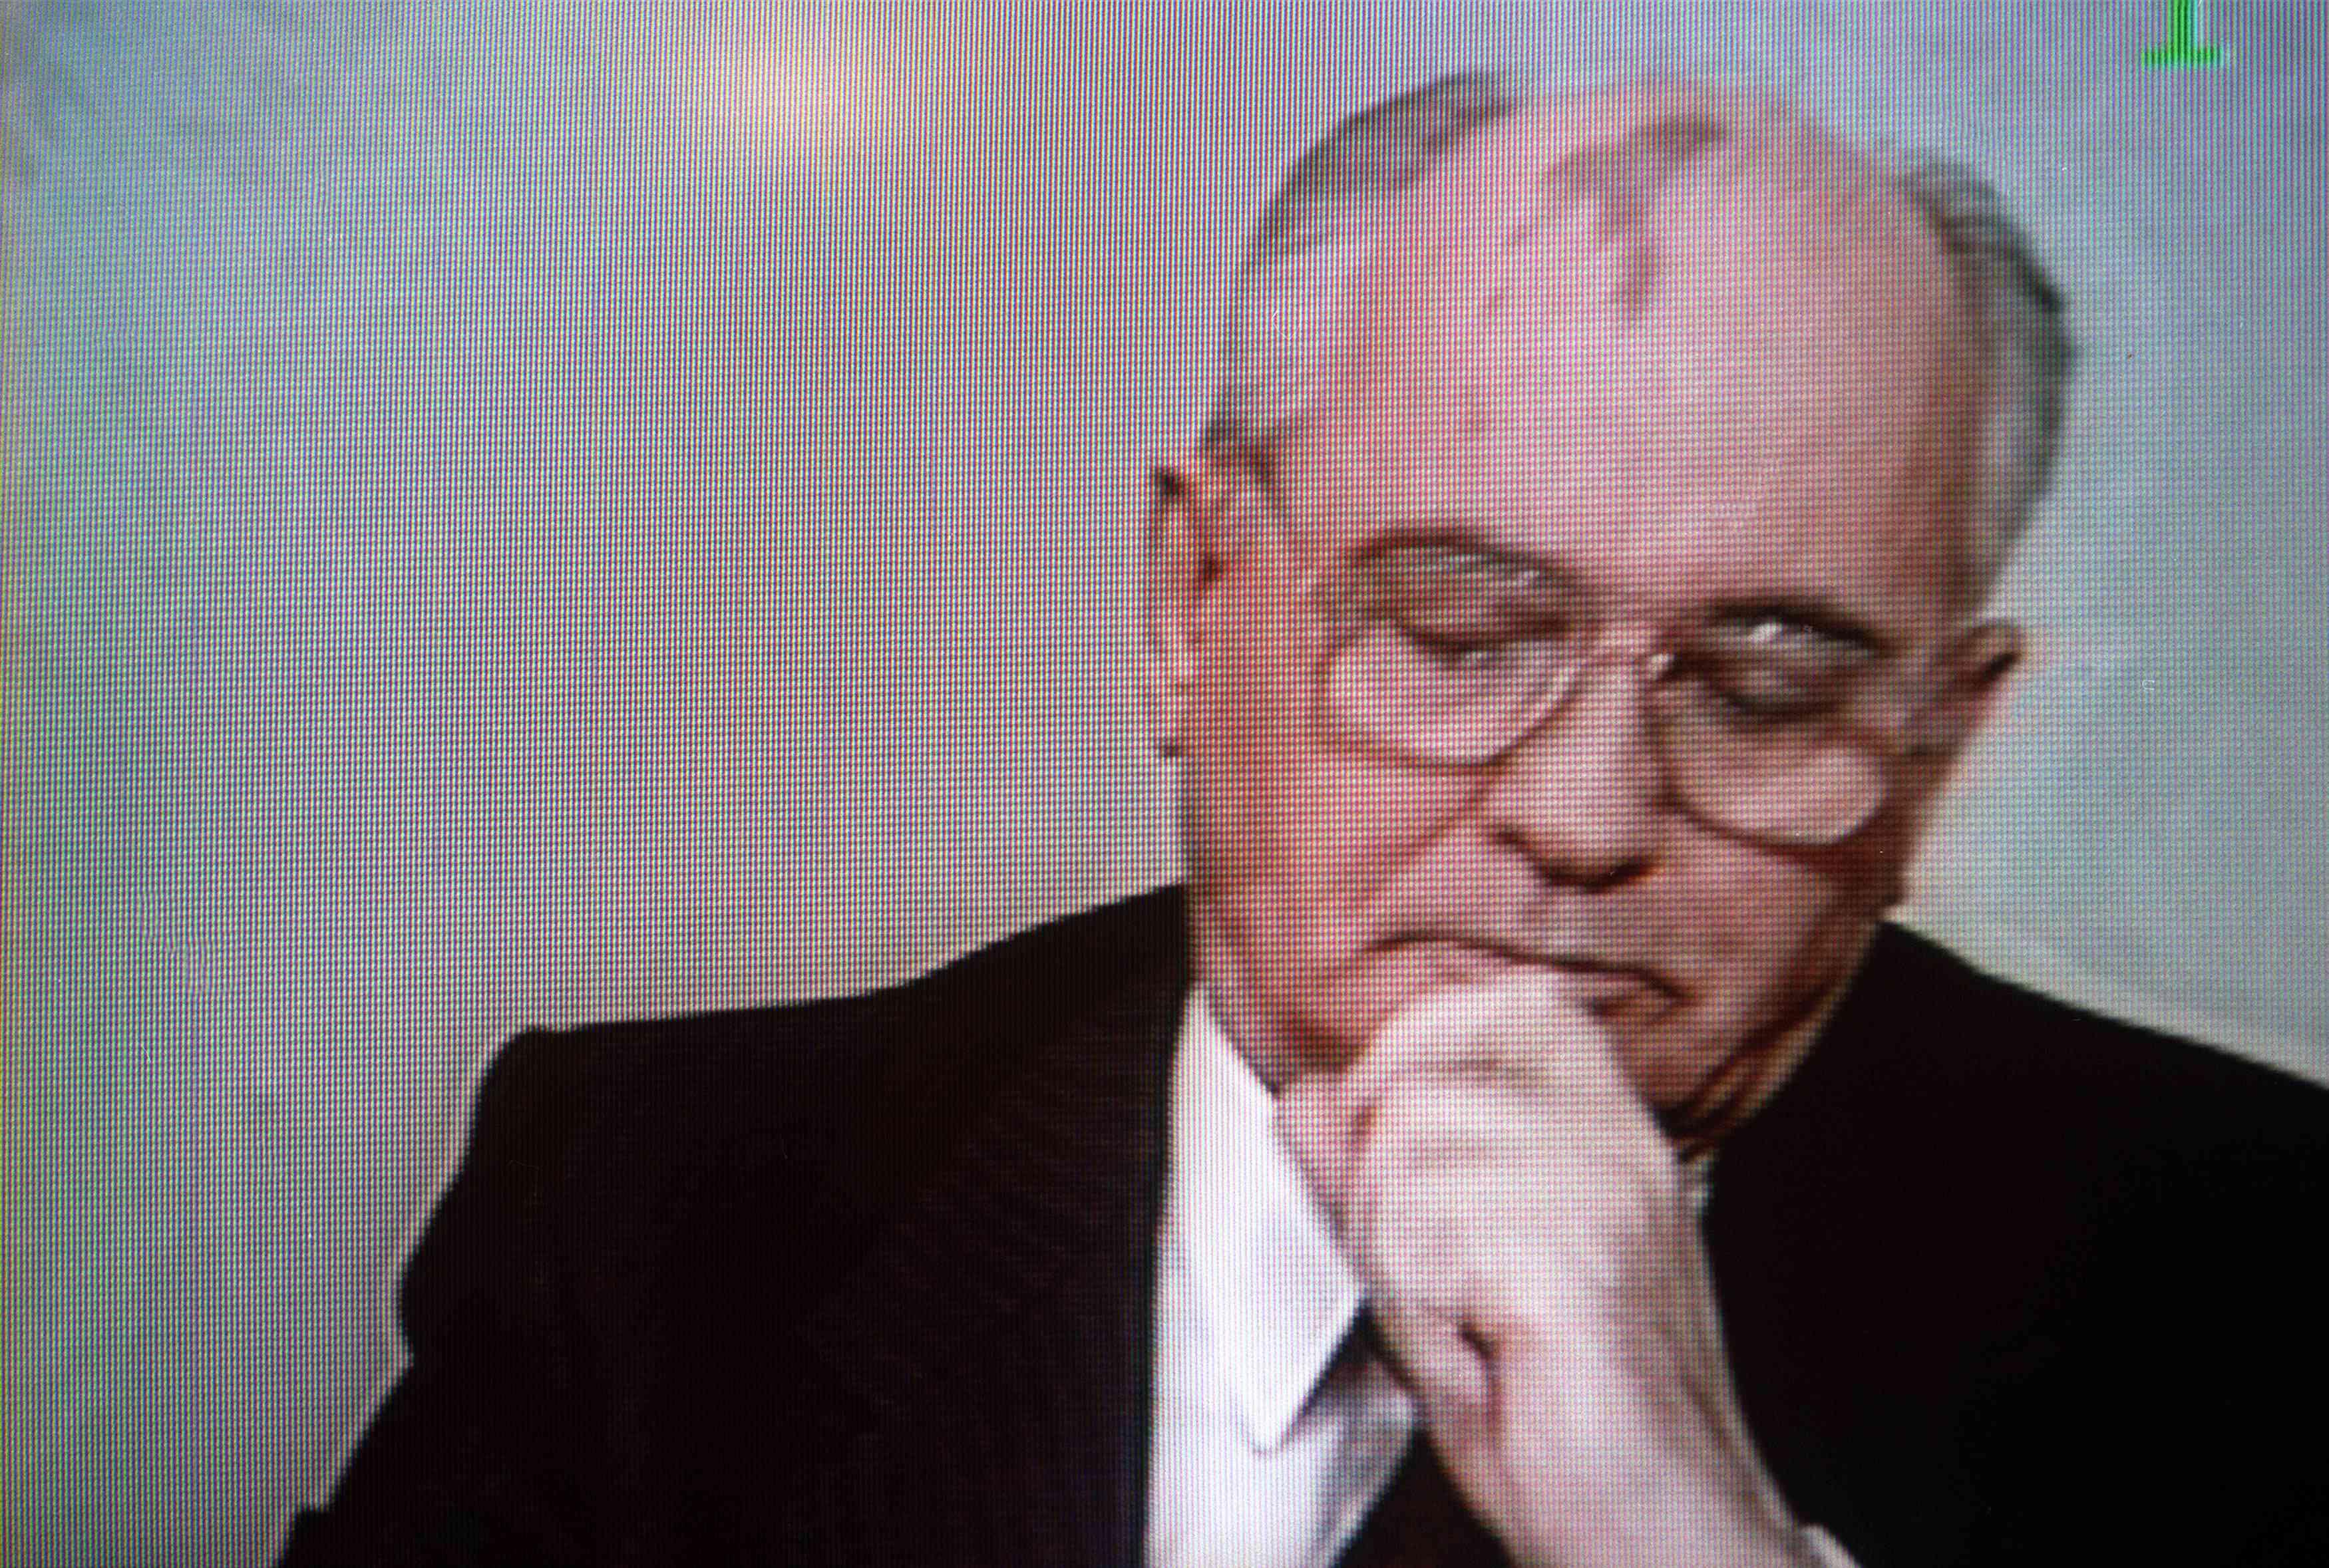 Soviet President Mikhail Gorbachev looks